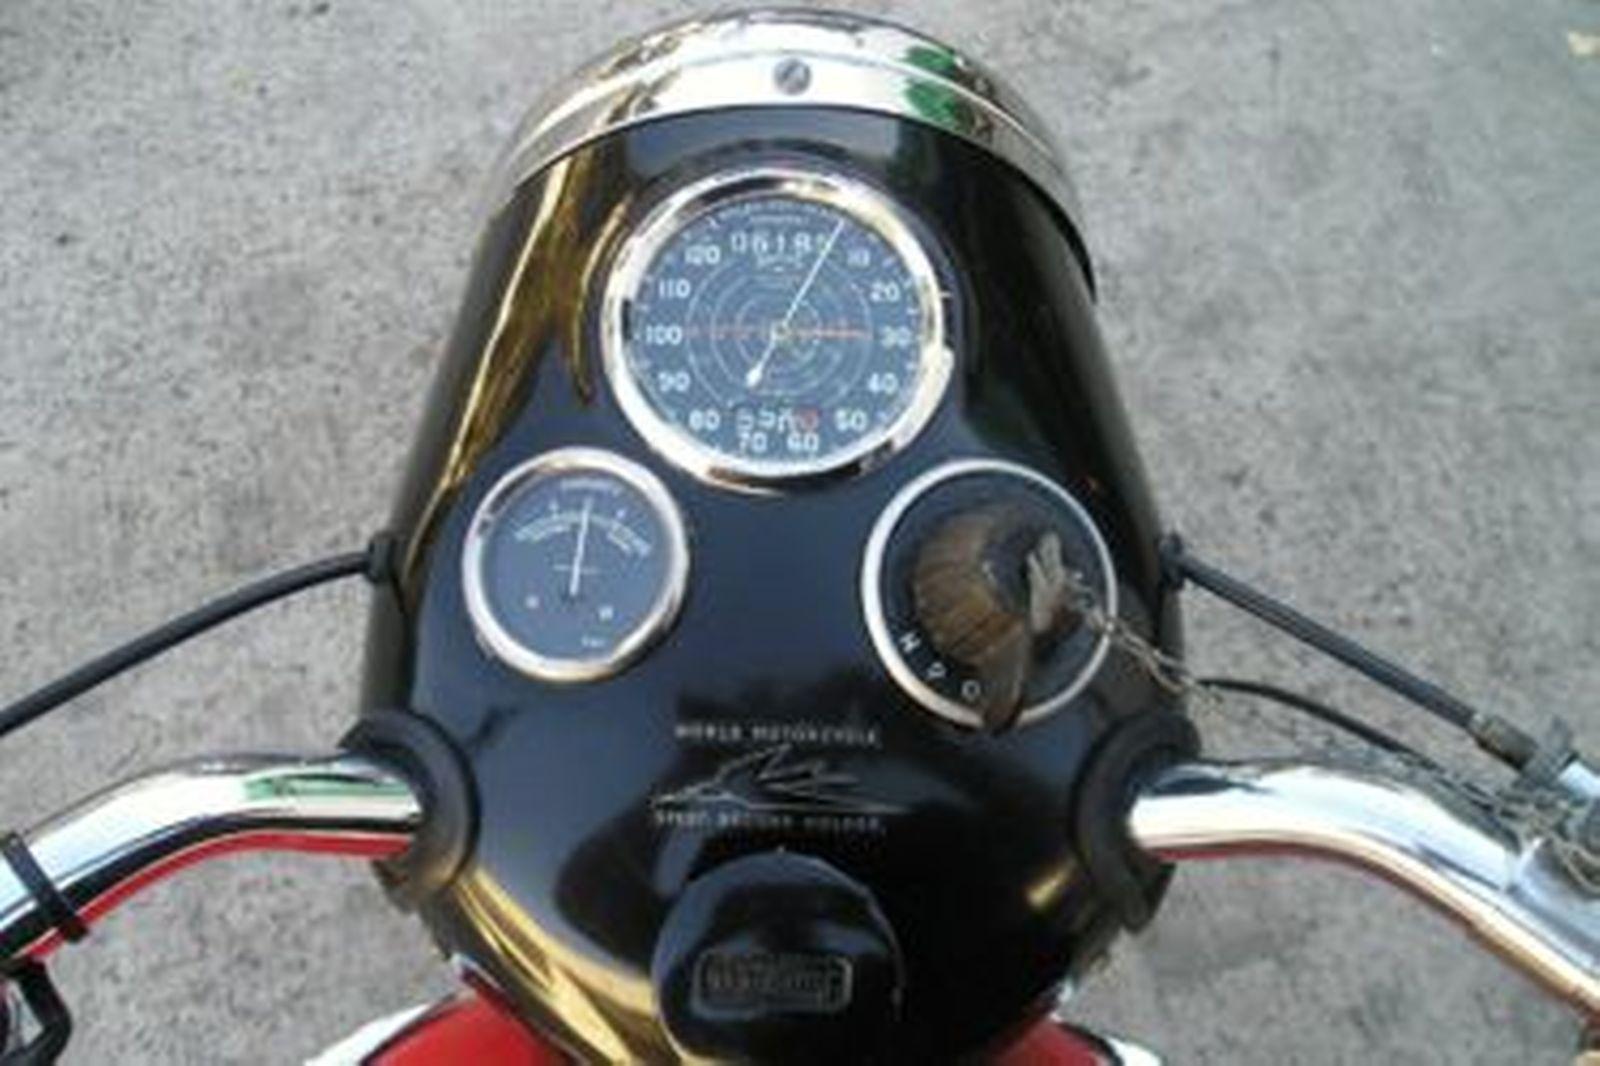 Triumph Thunderbird 650cc Motorcycle